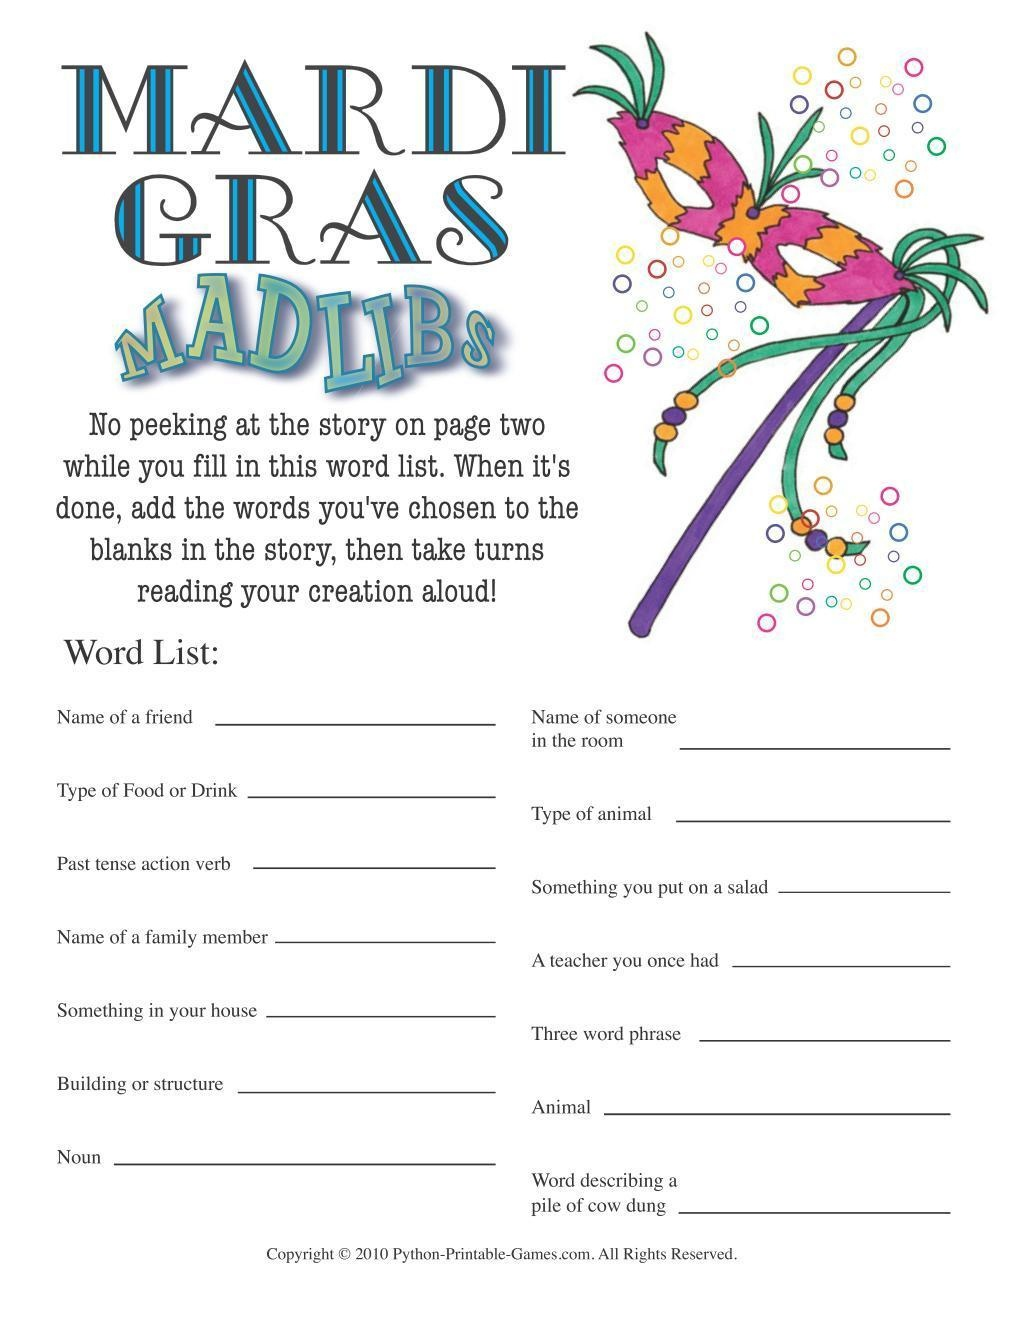 All Mardi Gras Games + Free Party Games - Free Printable Mardi Gras Games